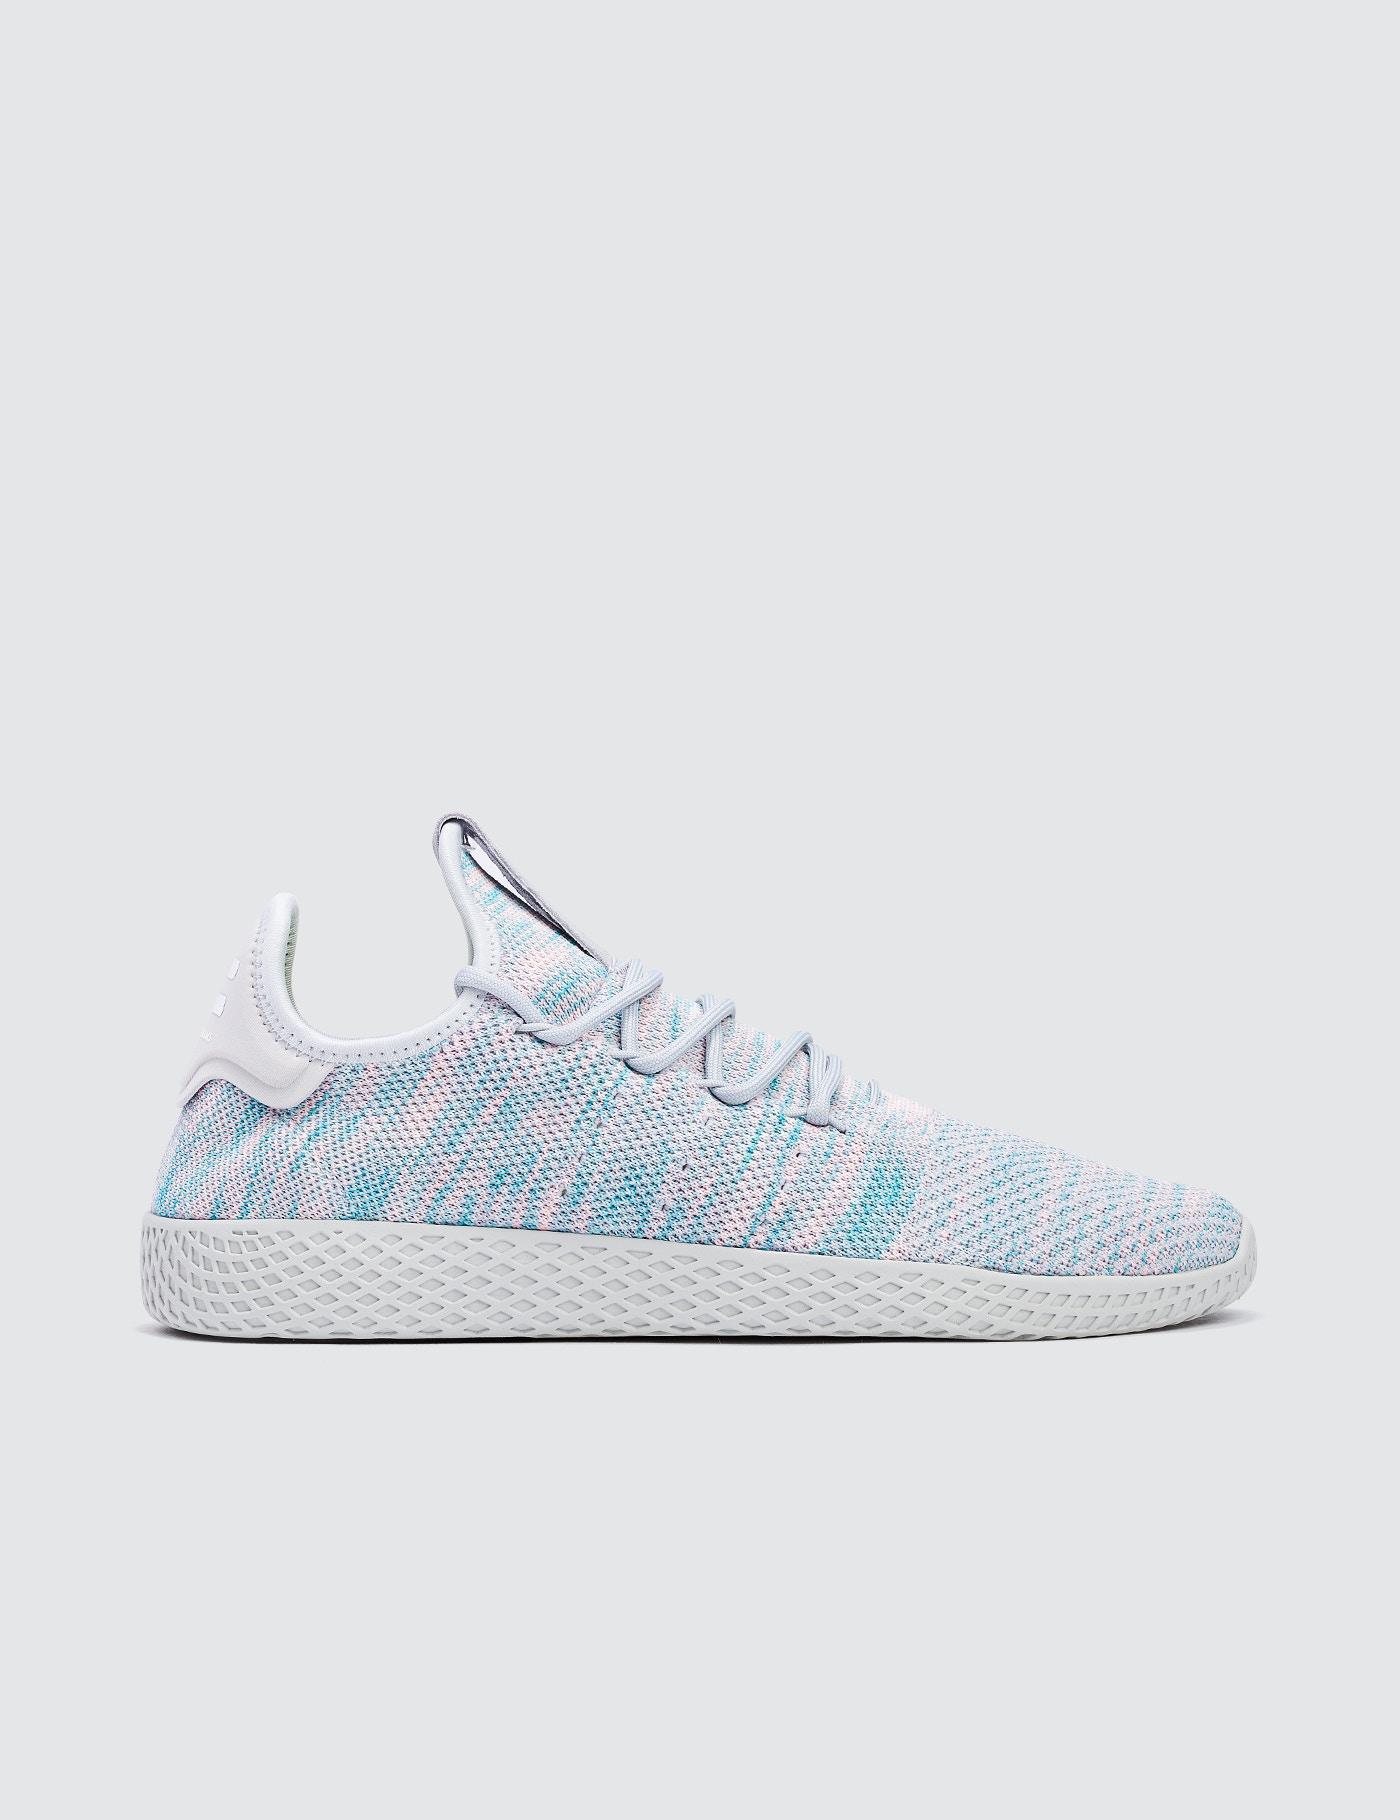 lyst adidas originali pharrell williams x pw tennis hu in blu per gli uomini.